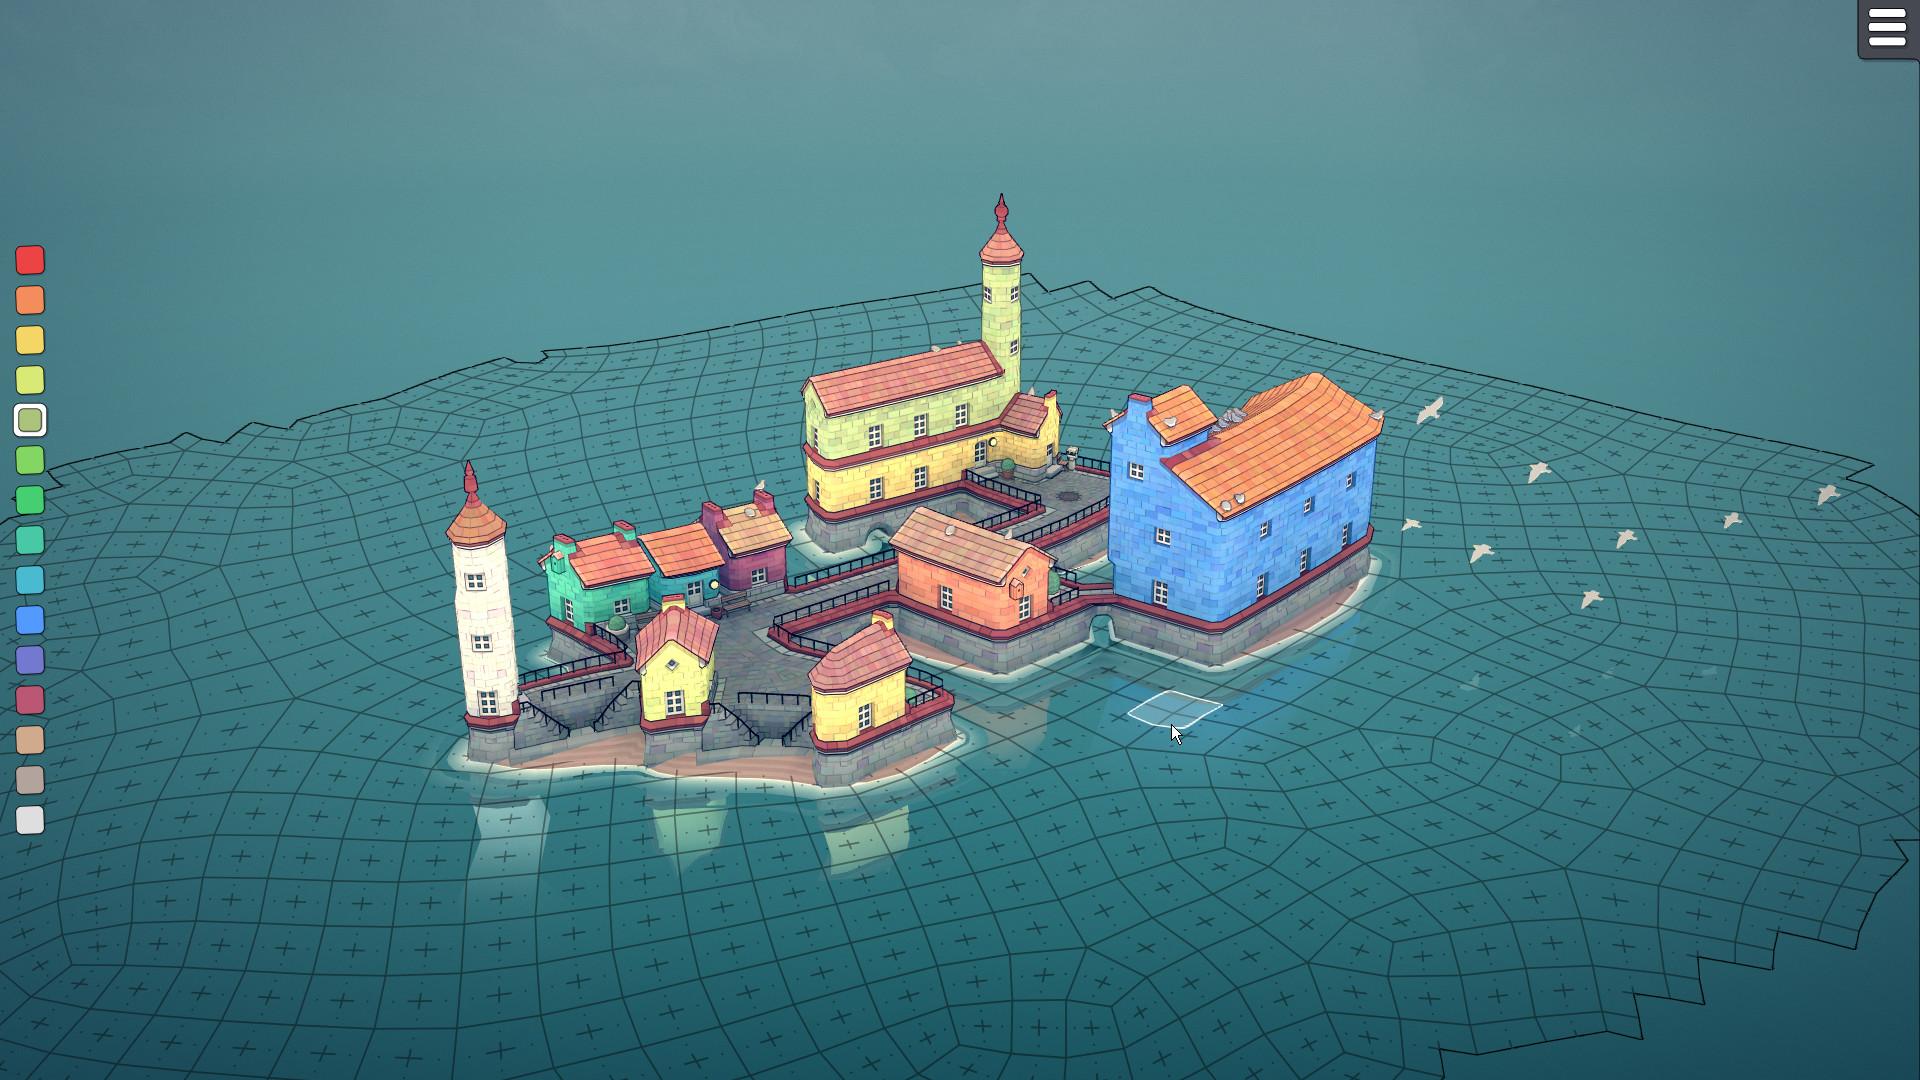 Townscraper - Top underappreciated indie games of 2020